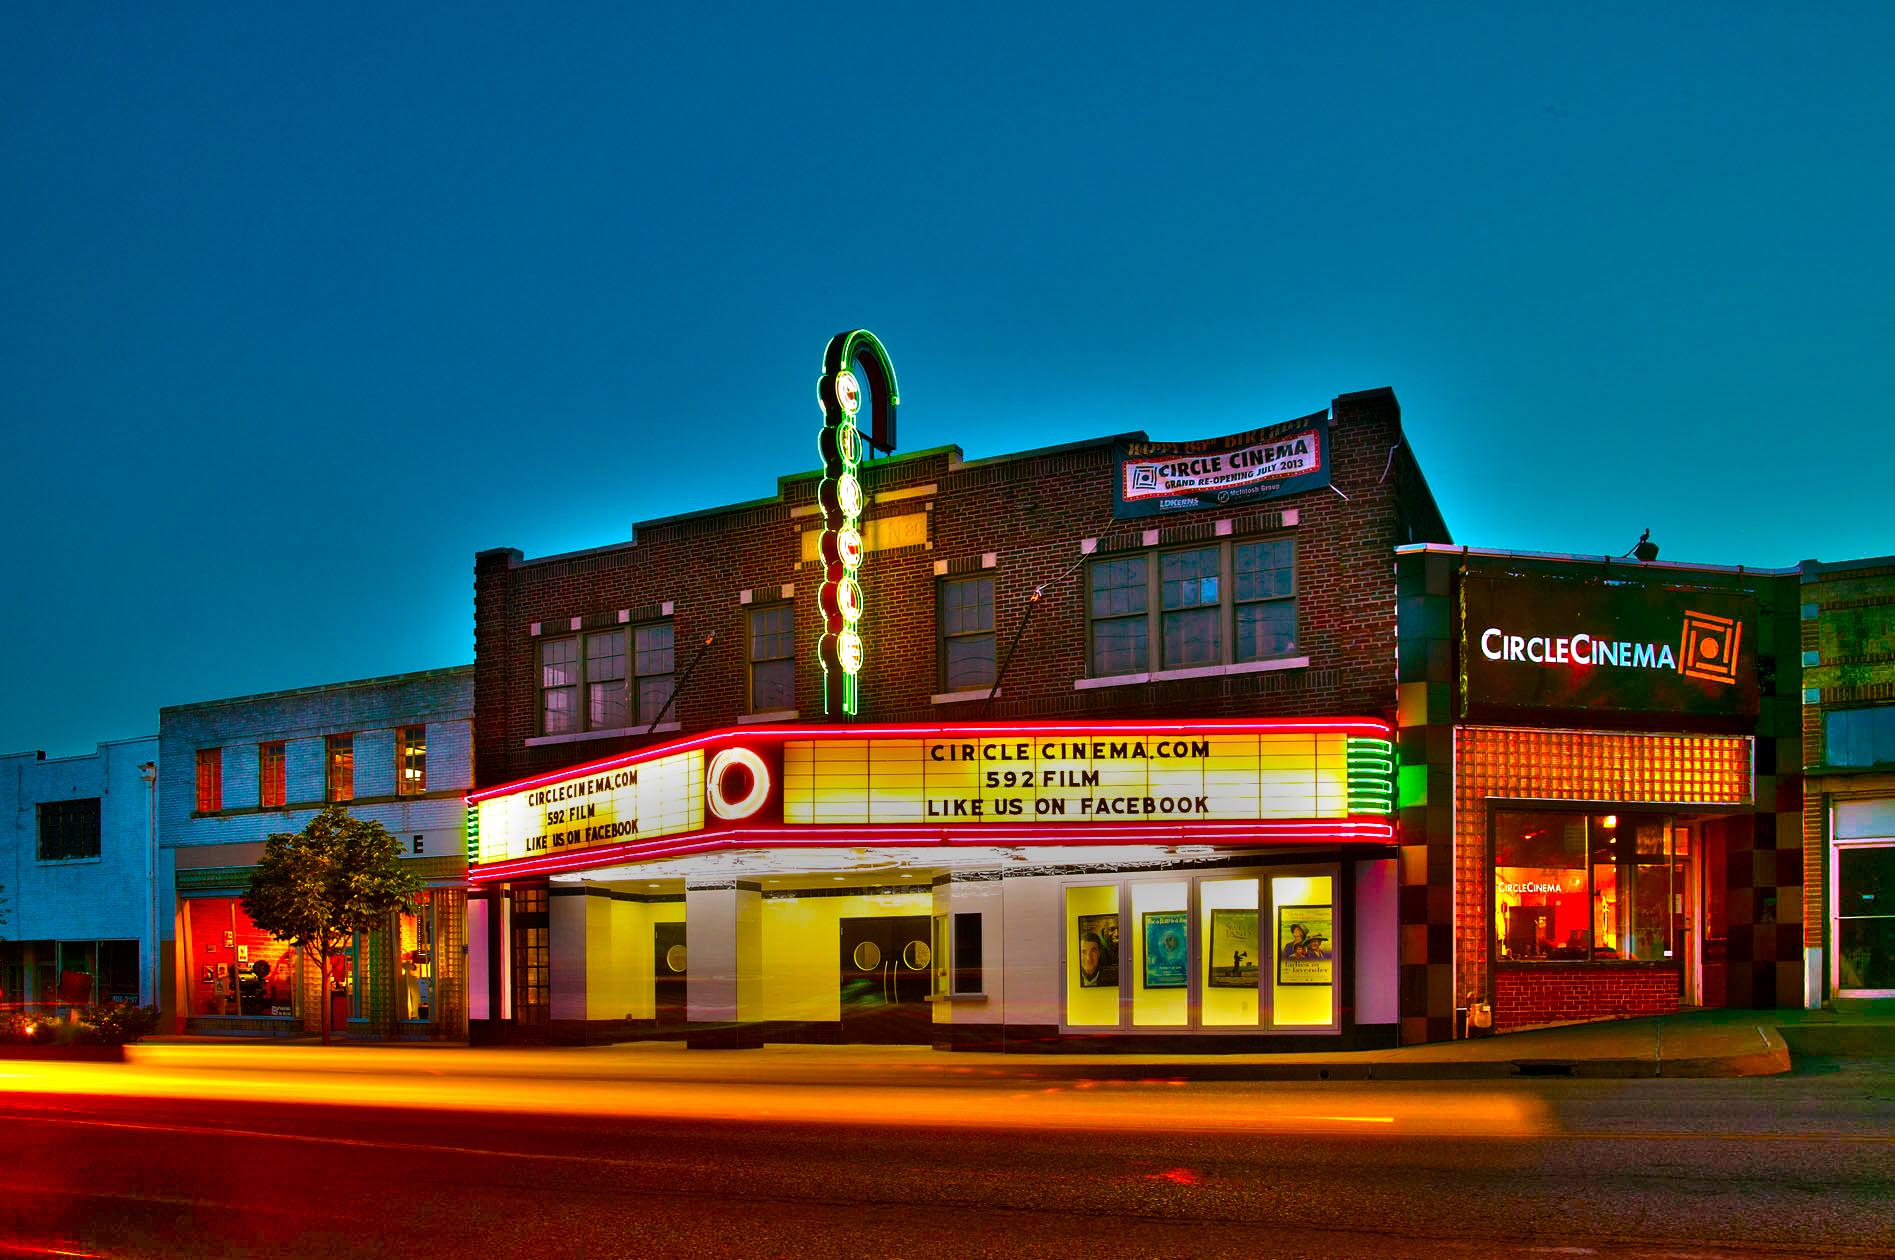 Circle Cinema front